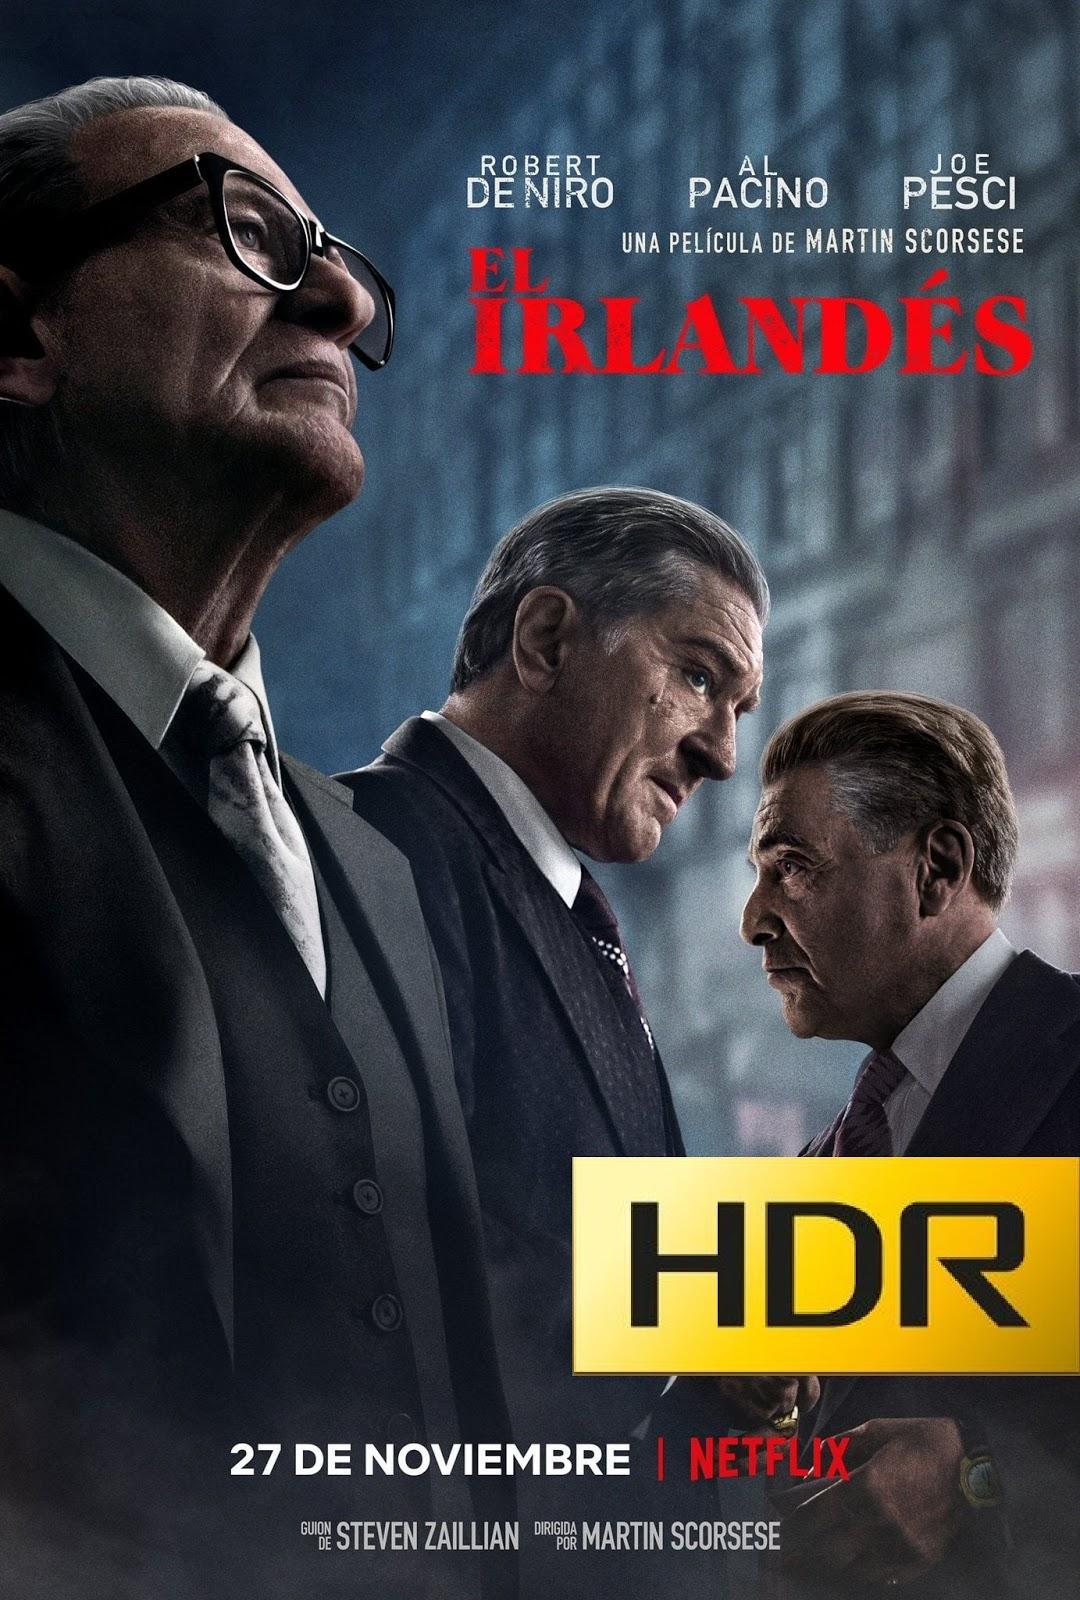 El Irlandés (2019) NF WEB-DL 1080p HDR Latino